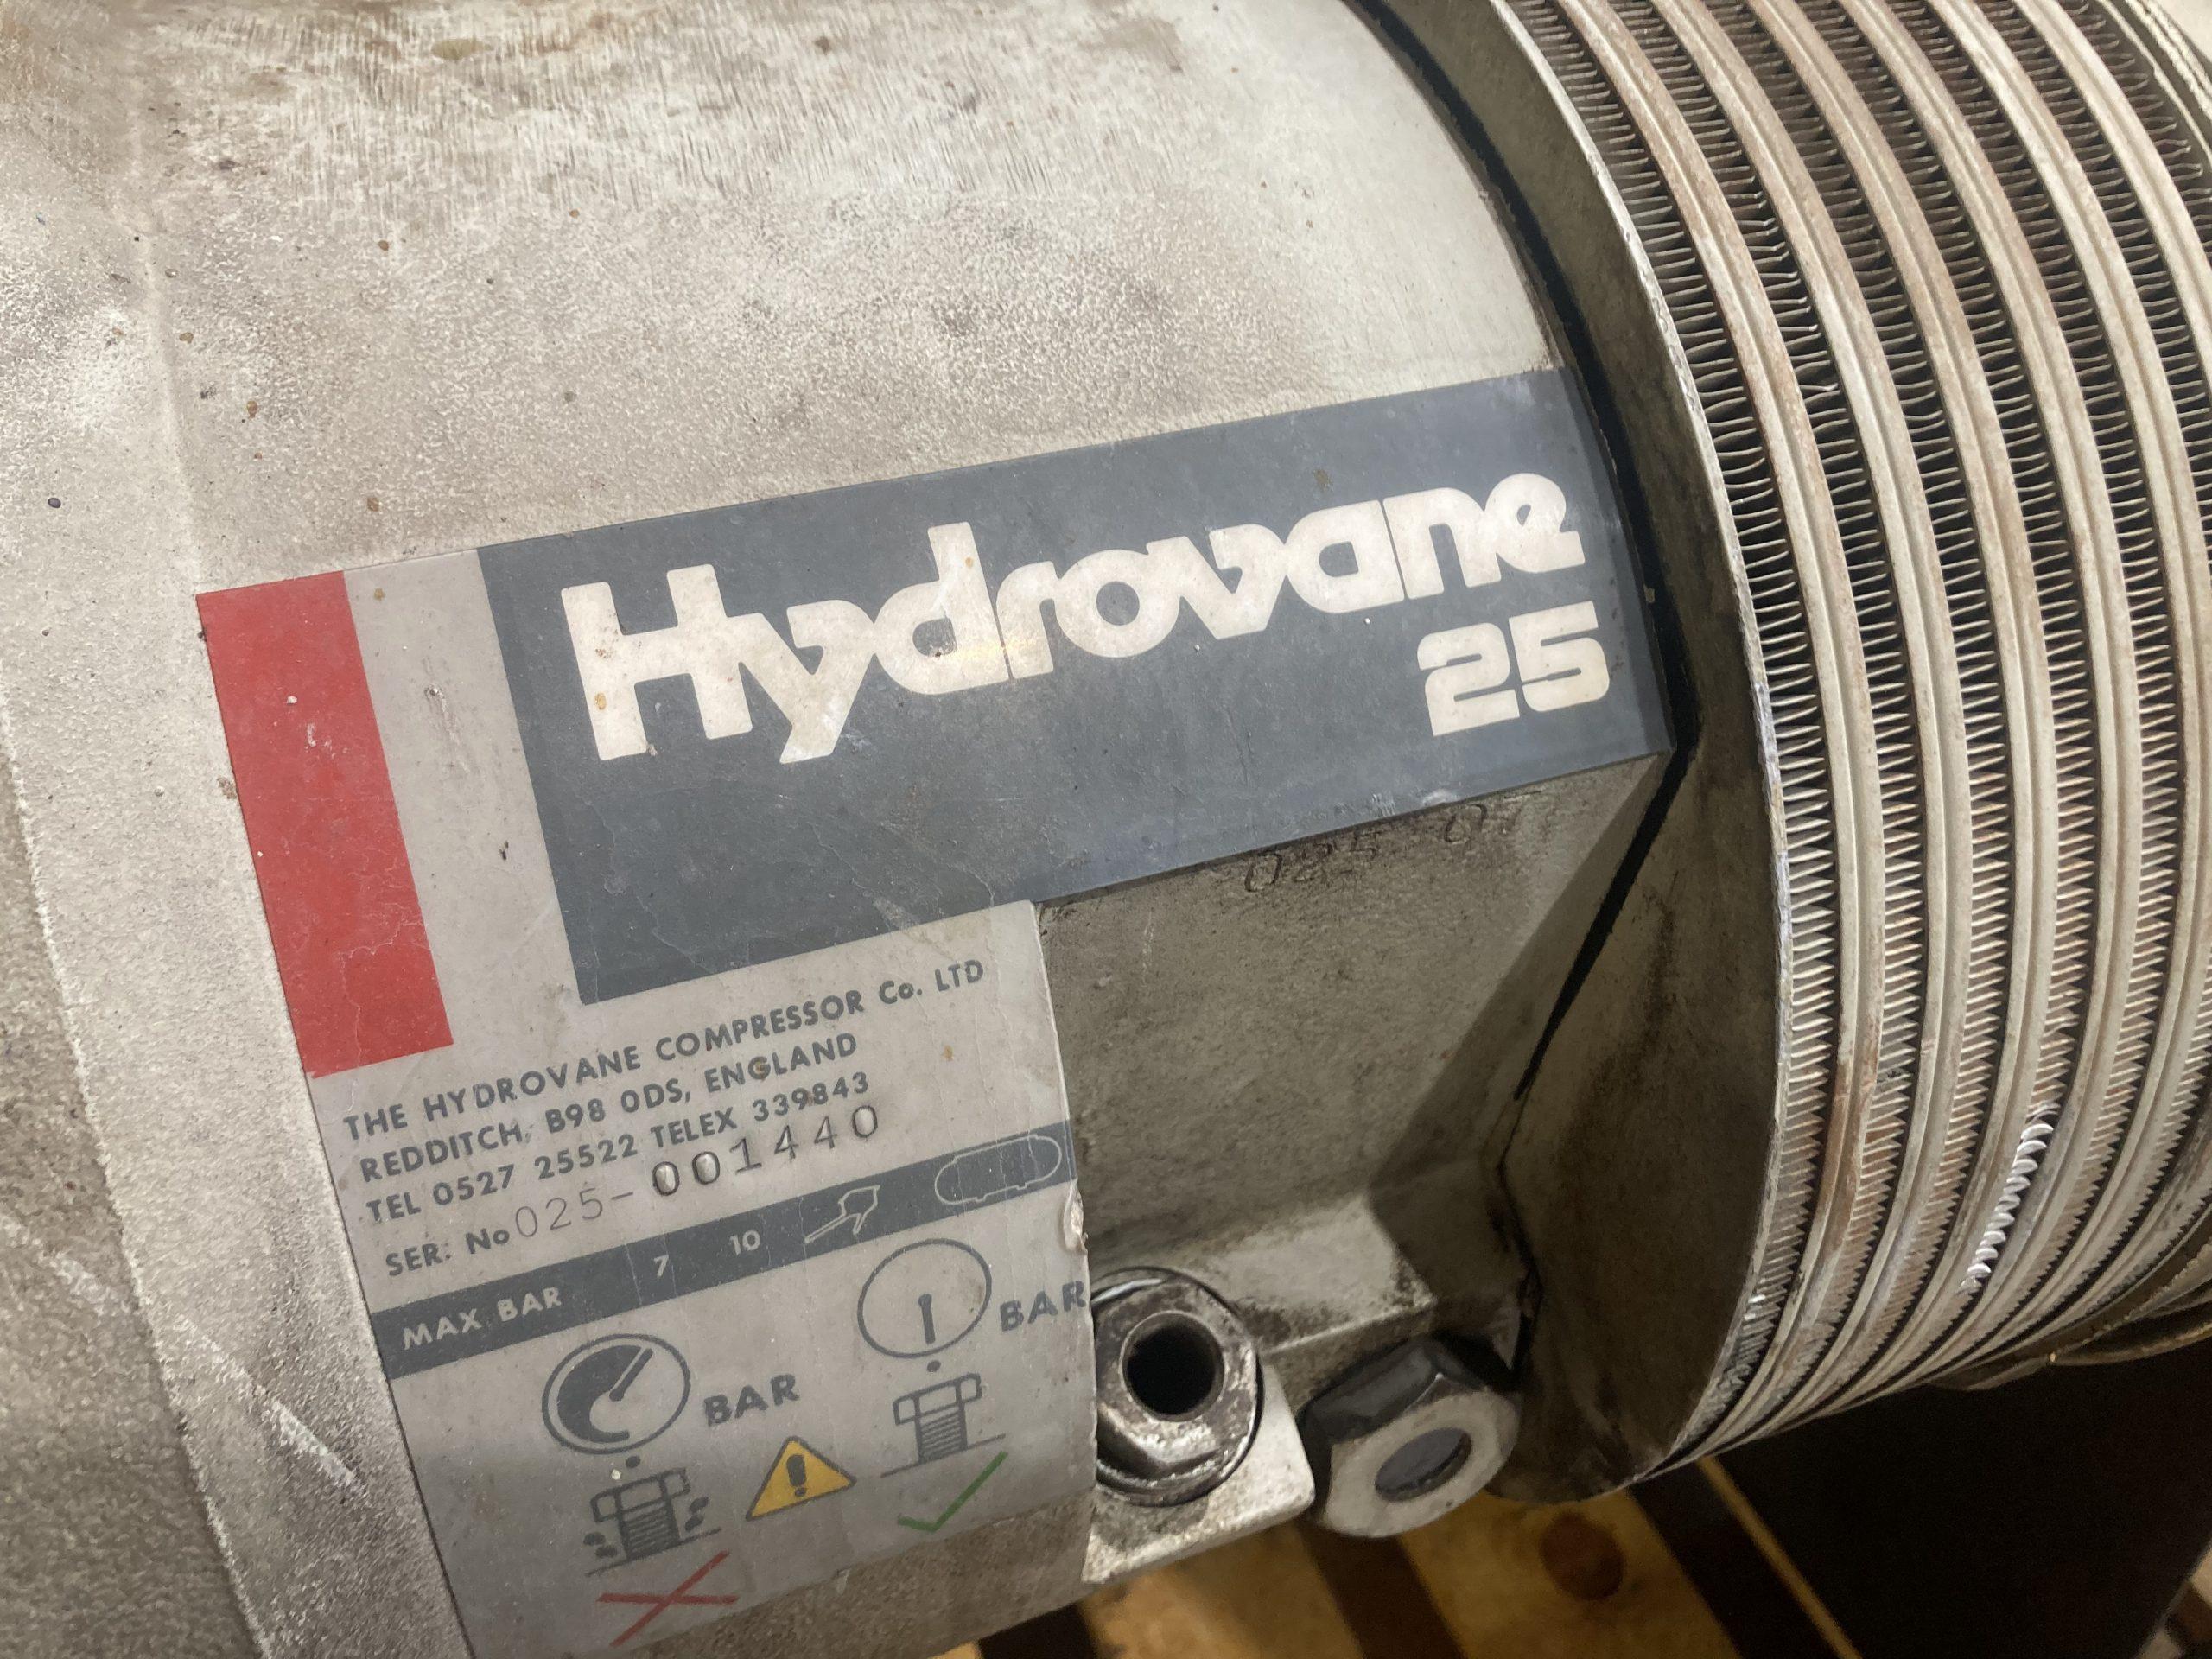 Hydrovane 25 PUTS